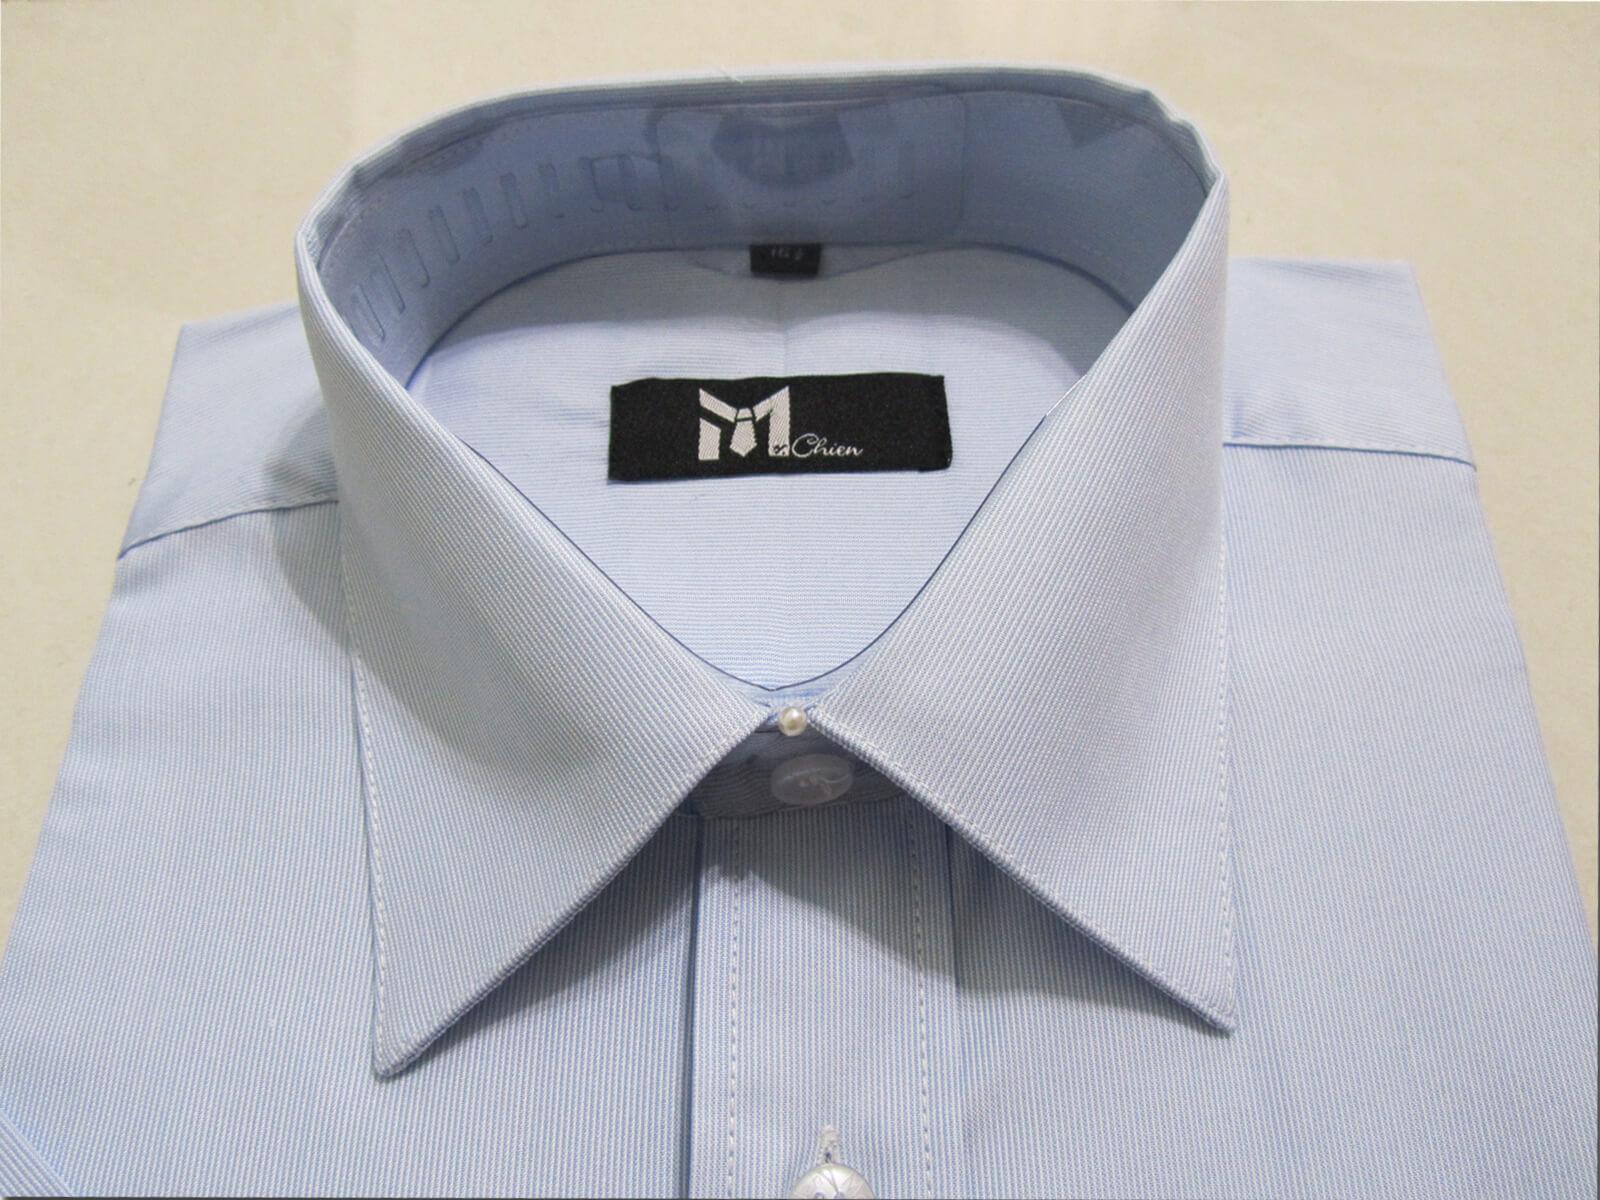 sun-e333特加大尺碼短袖條紋襯衫、上班族襯衫、標準襯衫、商務襯衫、正式場合襯衫、柔棉舒適襯衫、不皺免燙襯衫、細條紋襯衫(333-B518-01)白色斜條紋襯衫(333-B394-23)紫色斜條紋襯衫(333-B335-09)藍色直條紋襯衫 領圍:19.5、20.5、21.5、22.5 1